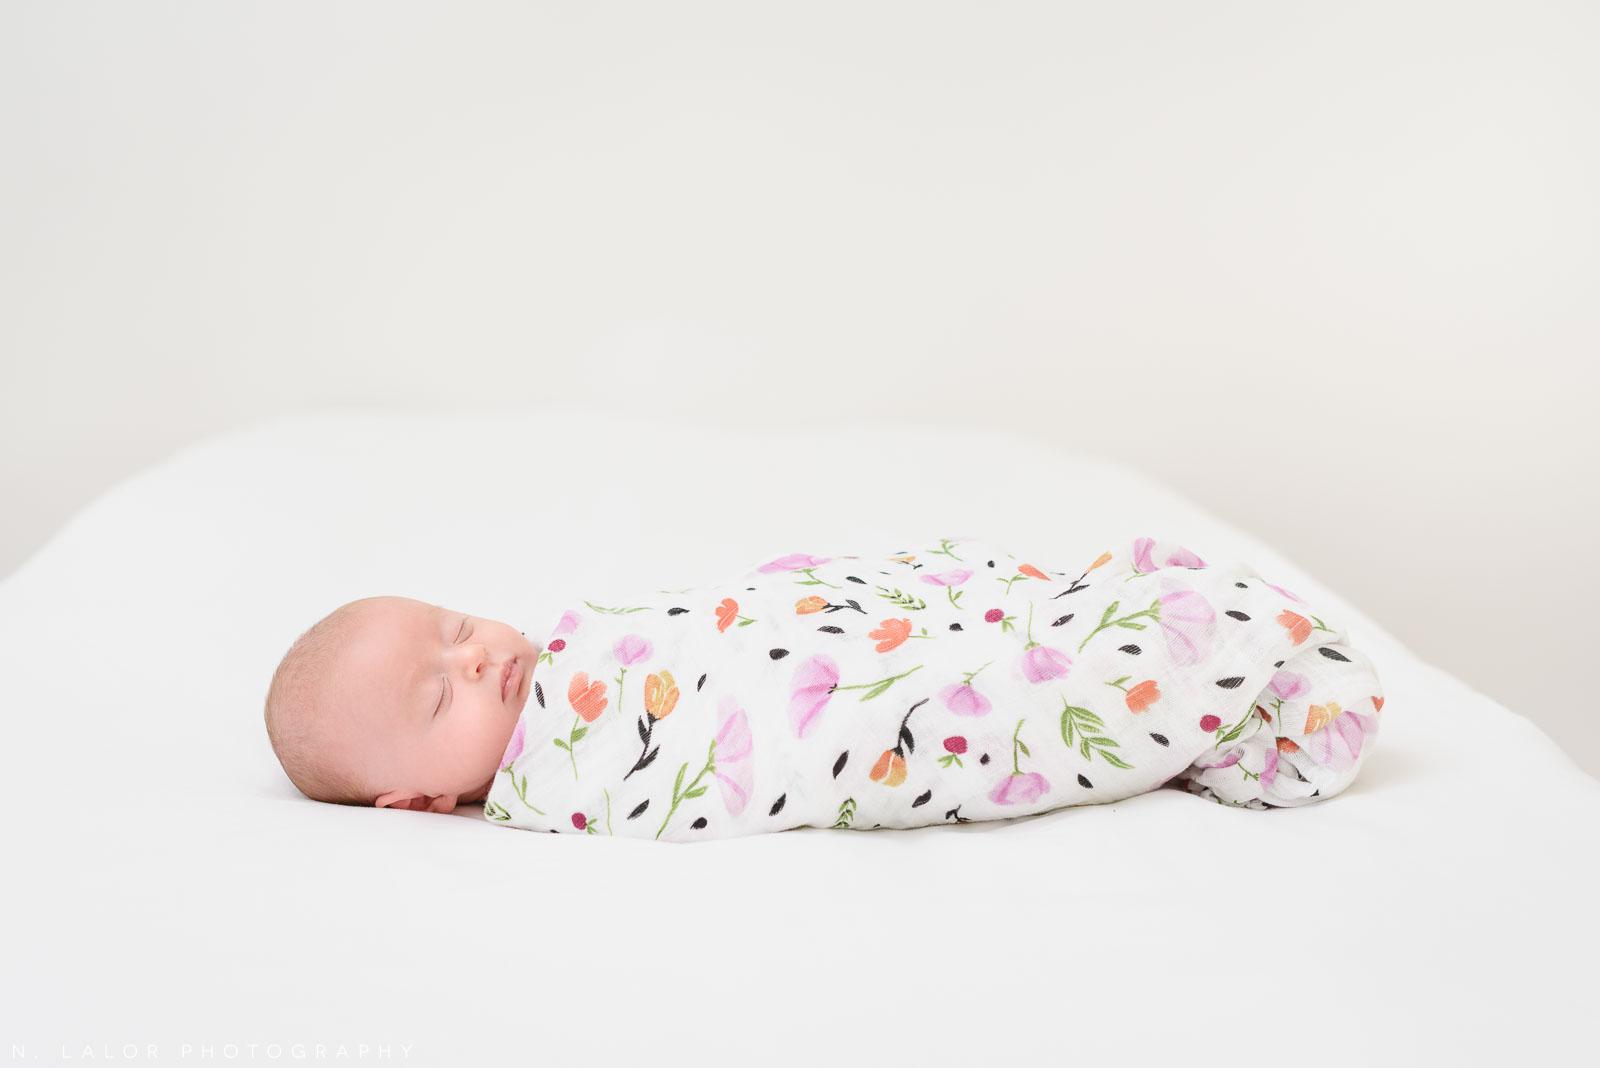 nlalor-photography-2017-11-21-clara-newborn-2.jpg